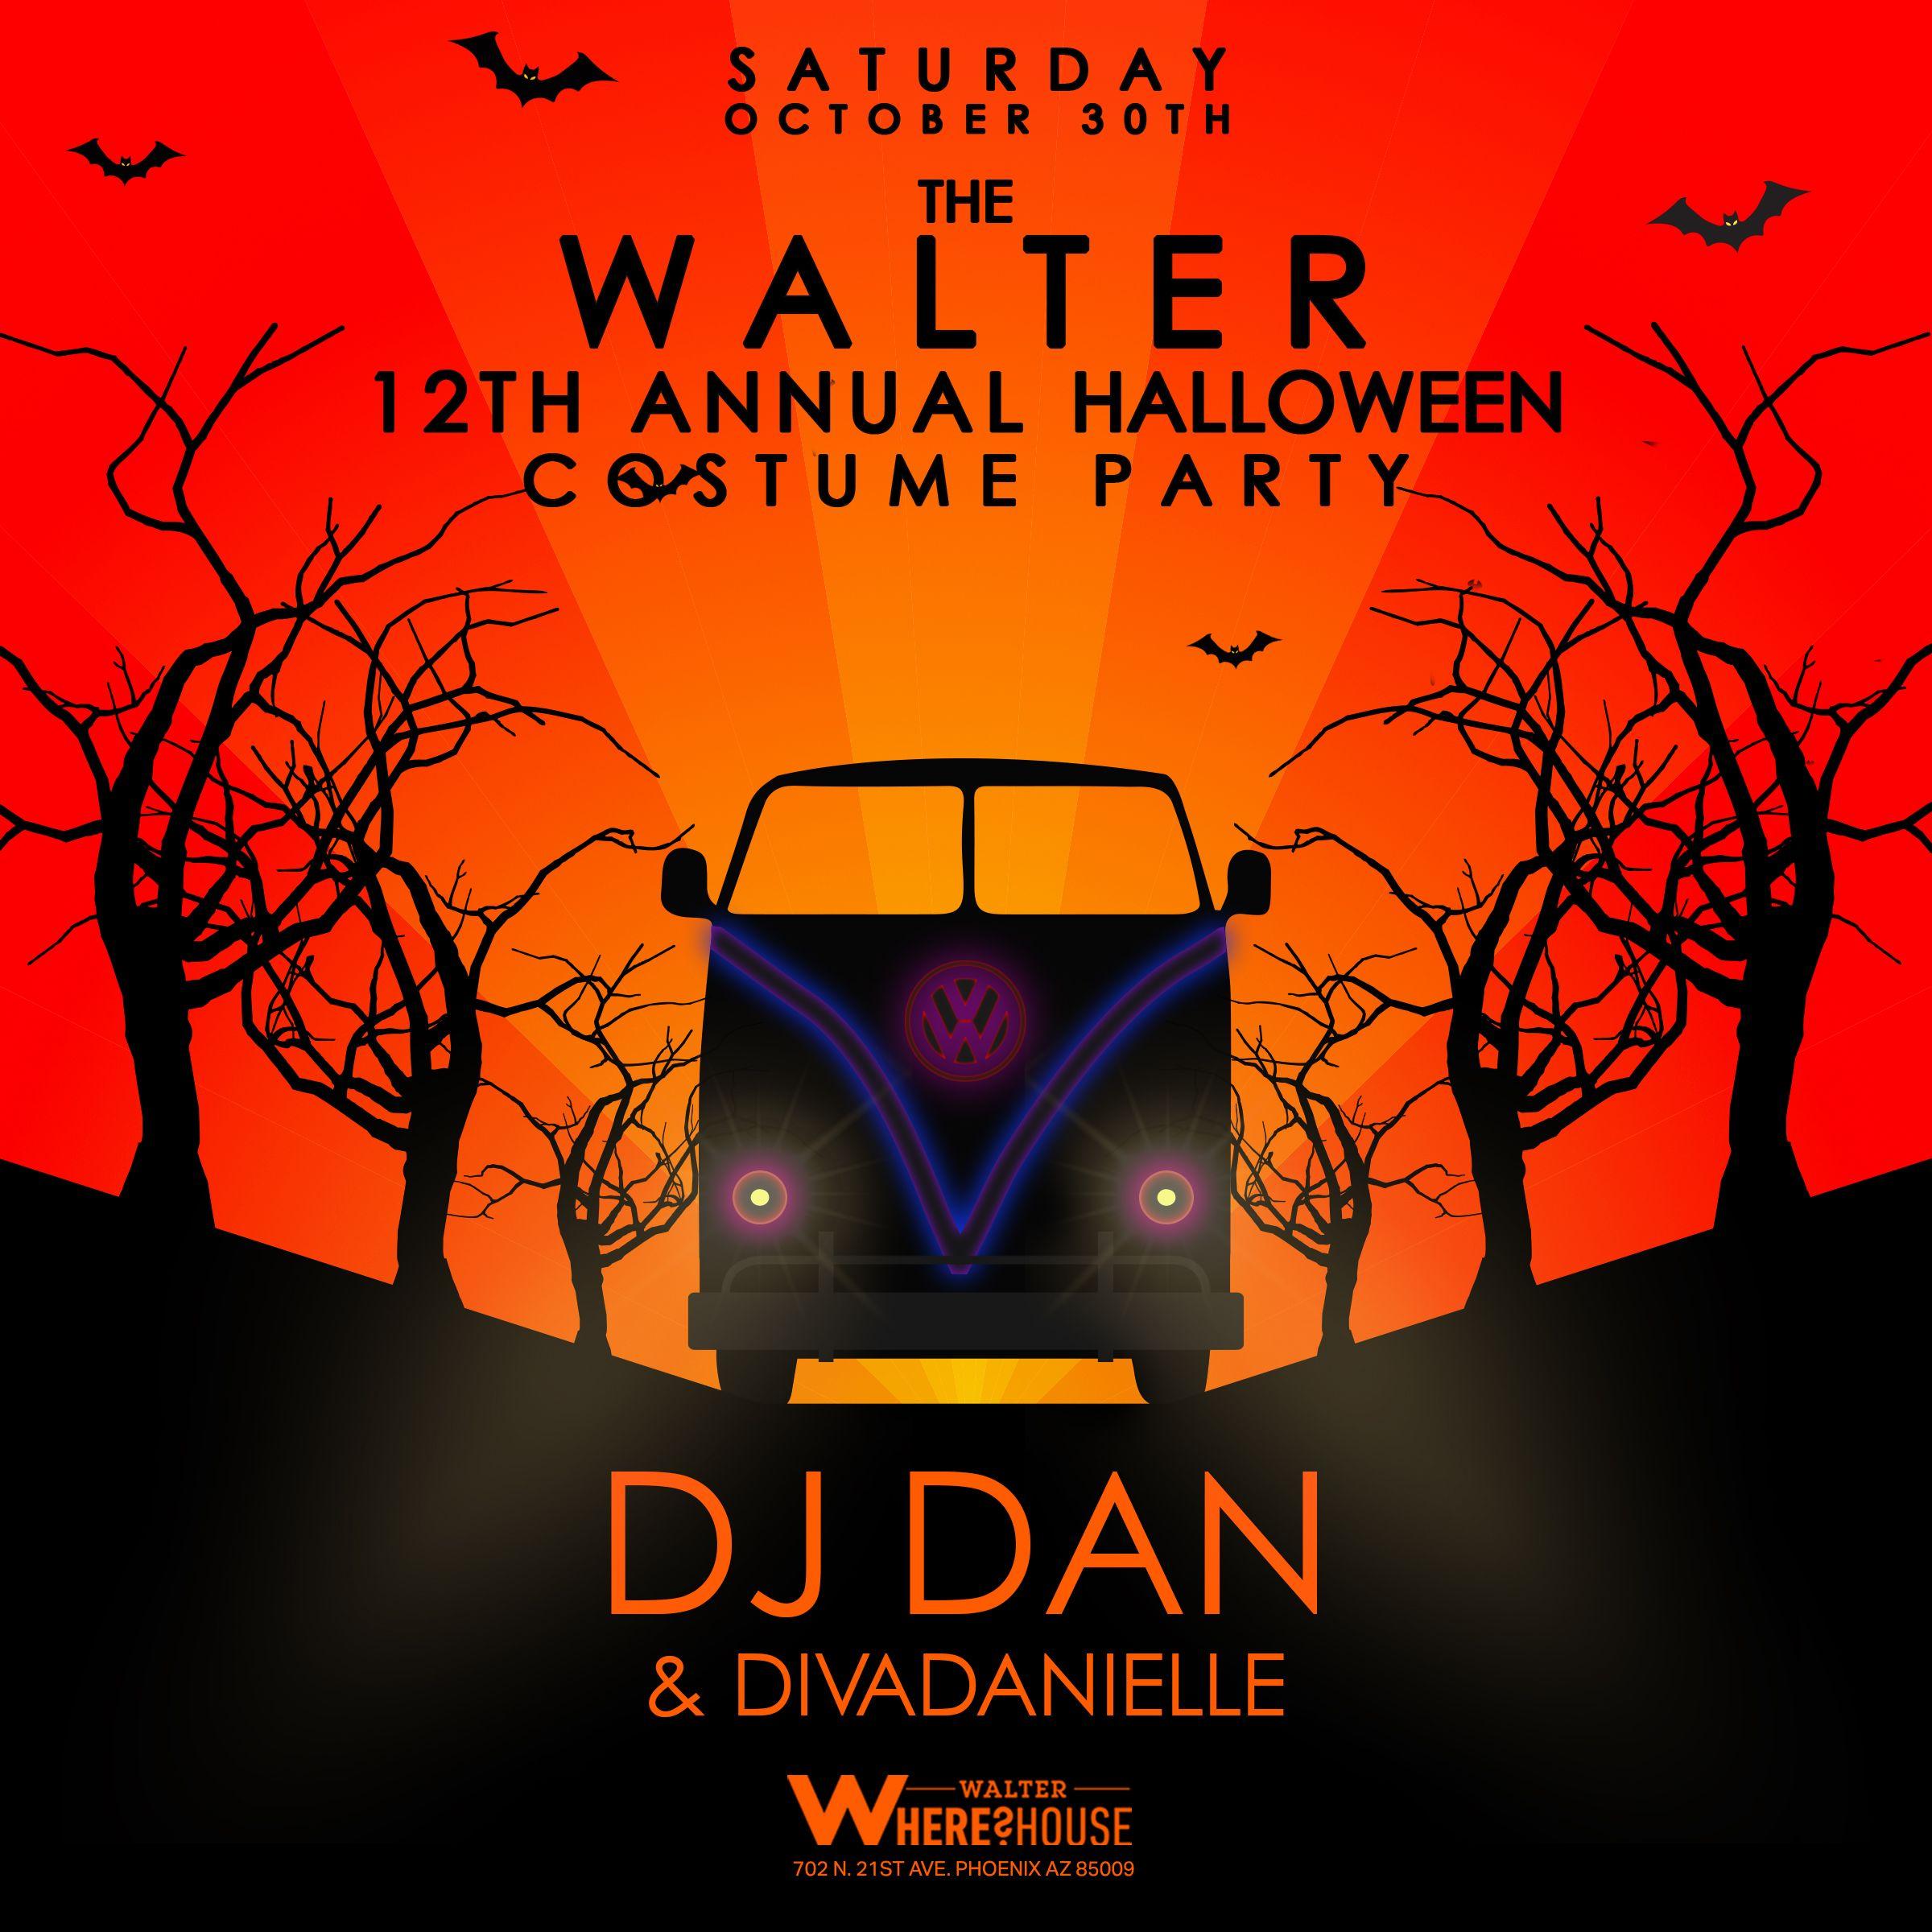 Walter 12th Annual Halloween Party: DJ Dan & divaDanielle: